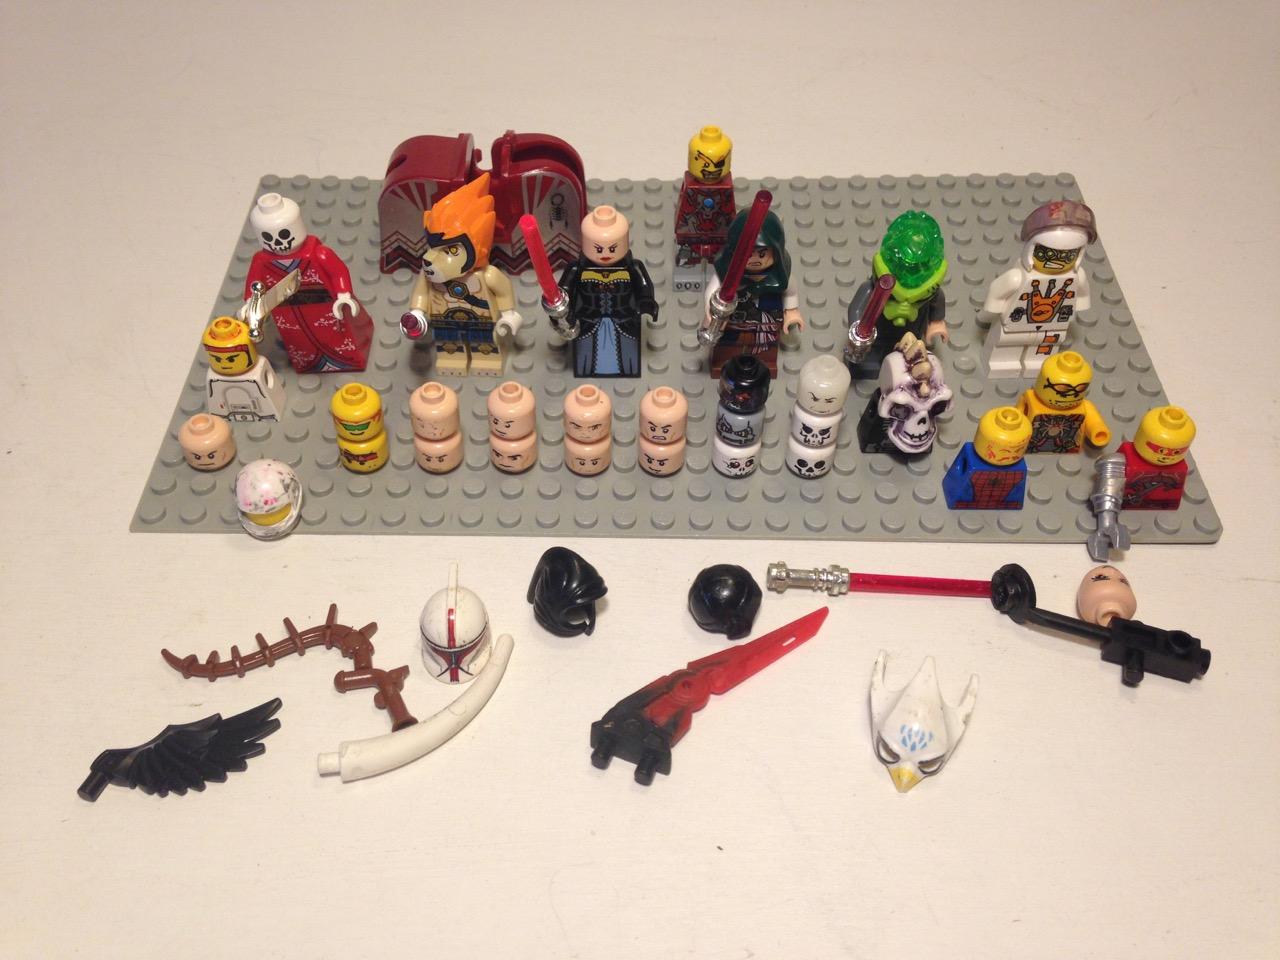 LE034 LEGO VINTAGE NINJAGO POTTER, STARWARS MINIFIG HEADS, HELMETS, ACCESSORIES